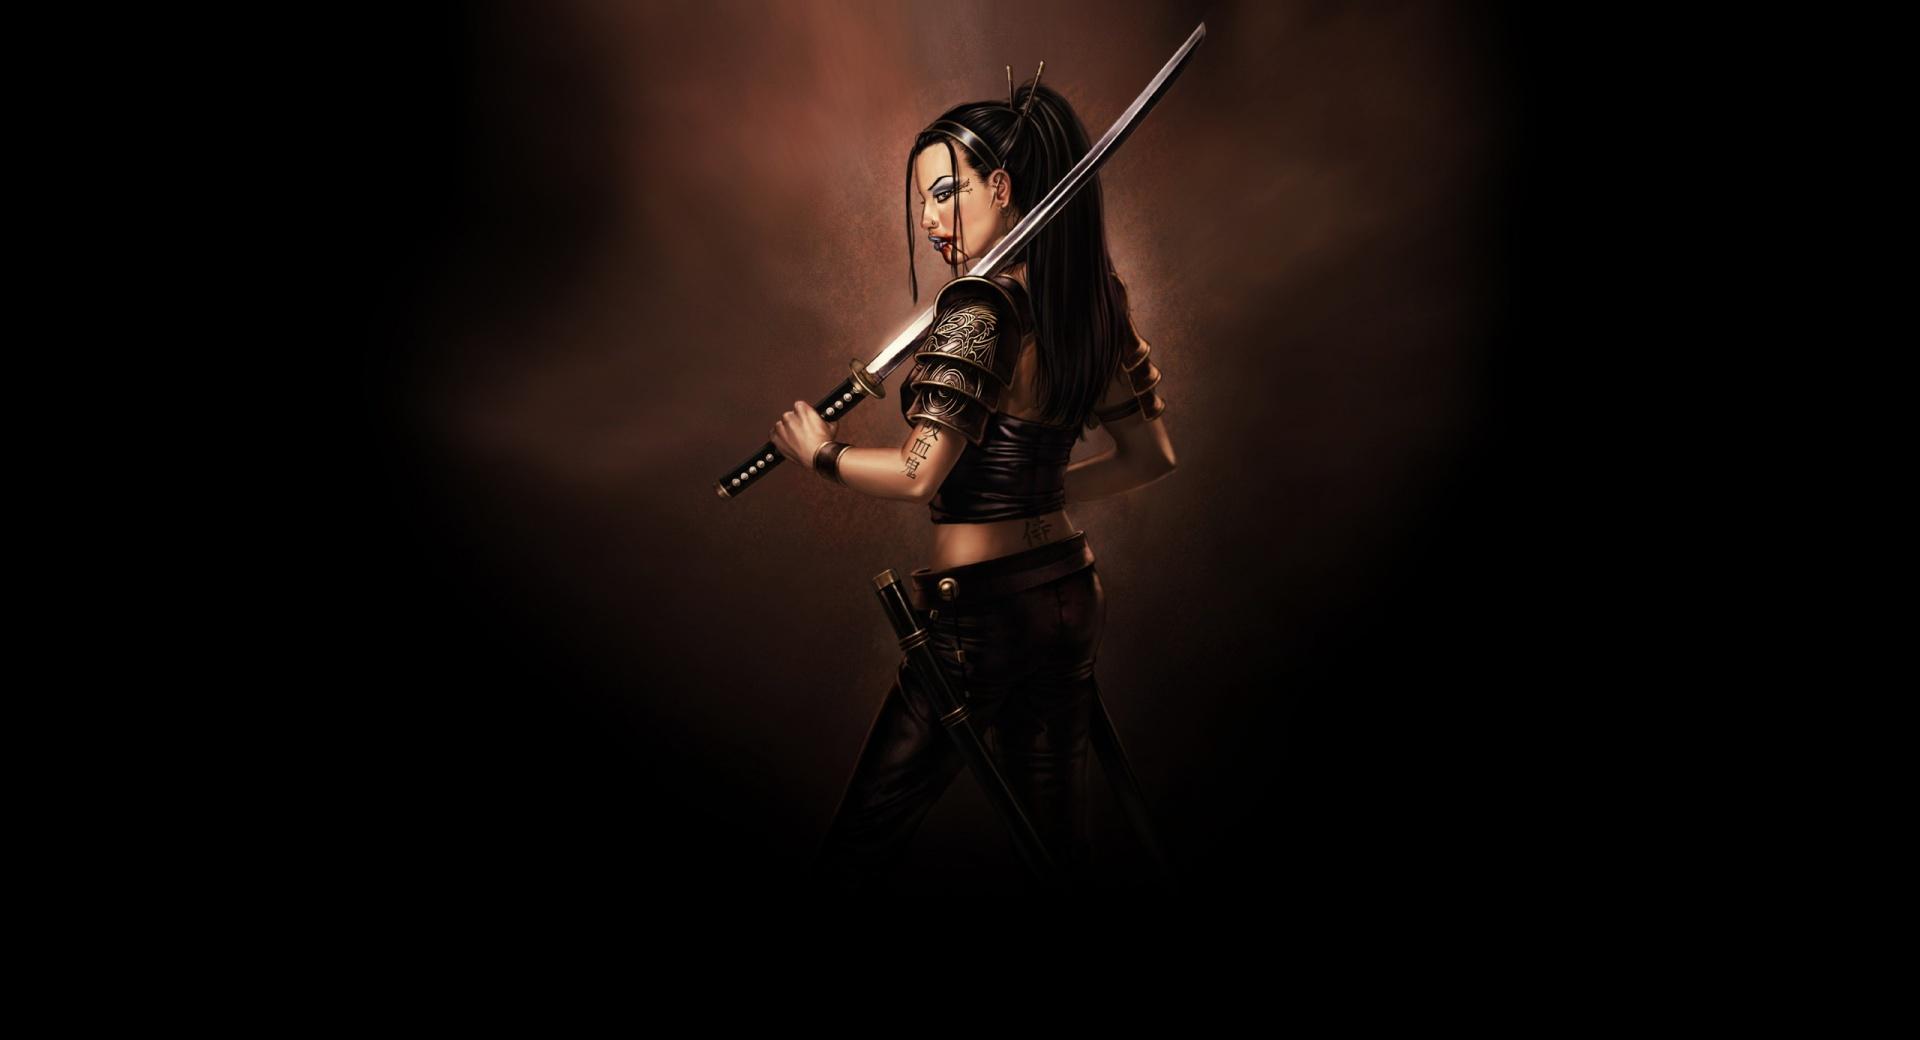 Samurai Sword wallpapers HD quality